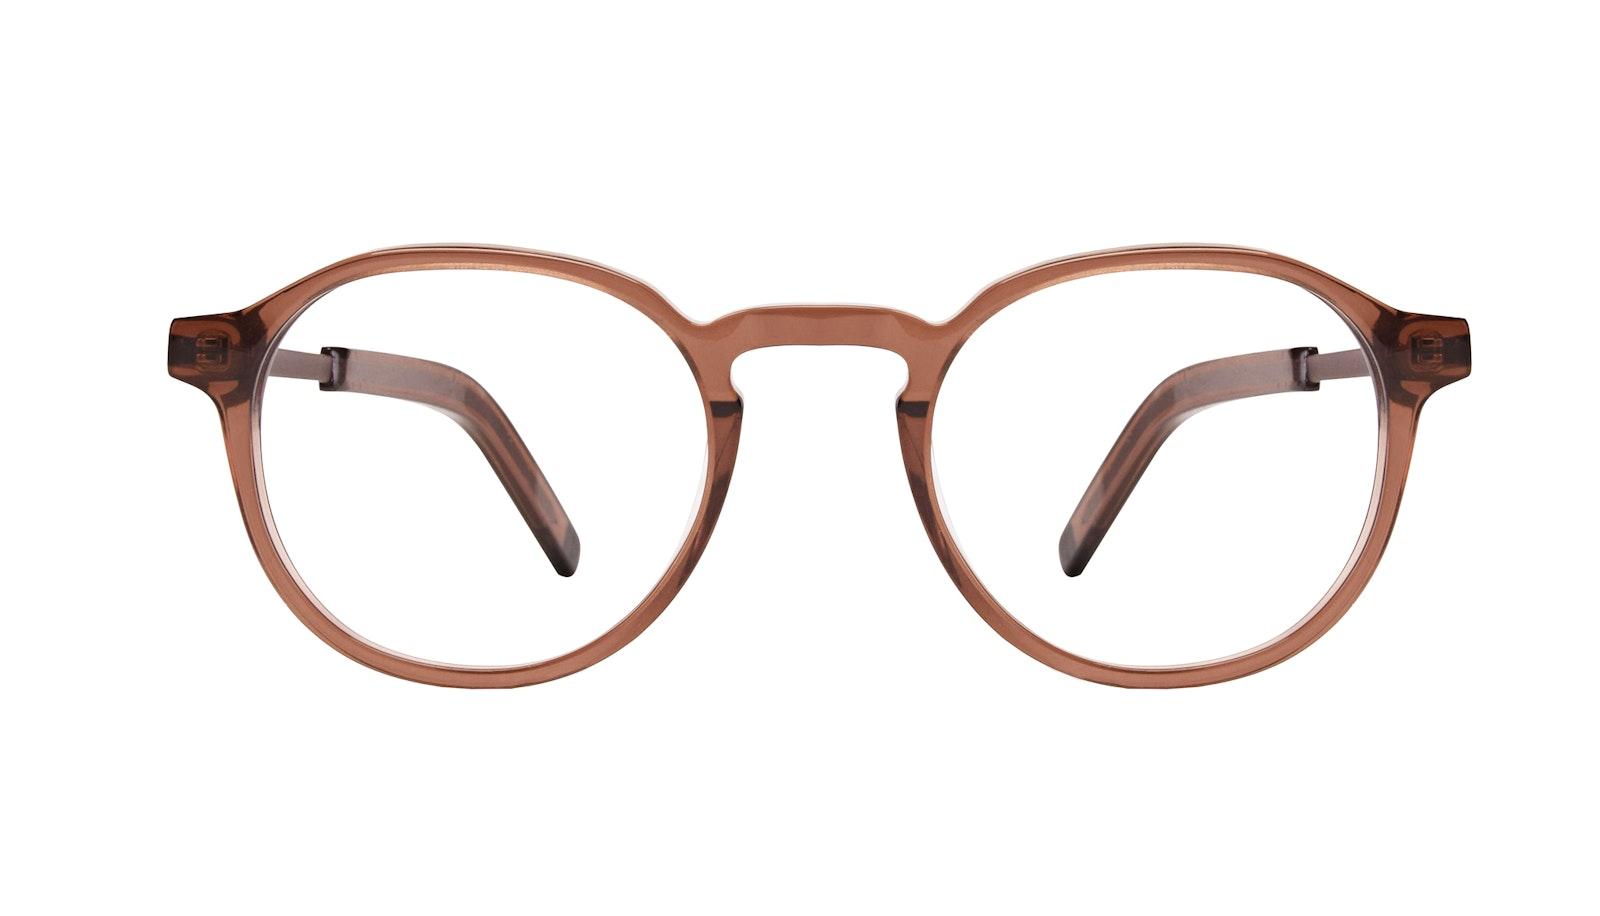 Affordable Fashion Glasses Round Eyeglasses Men Prime XL Terra